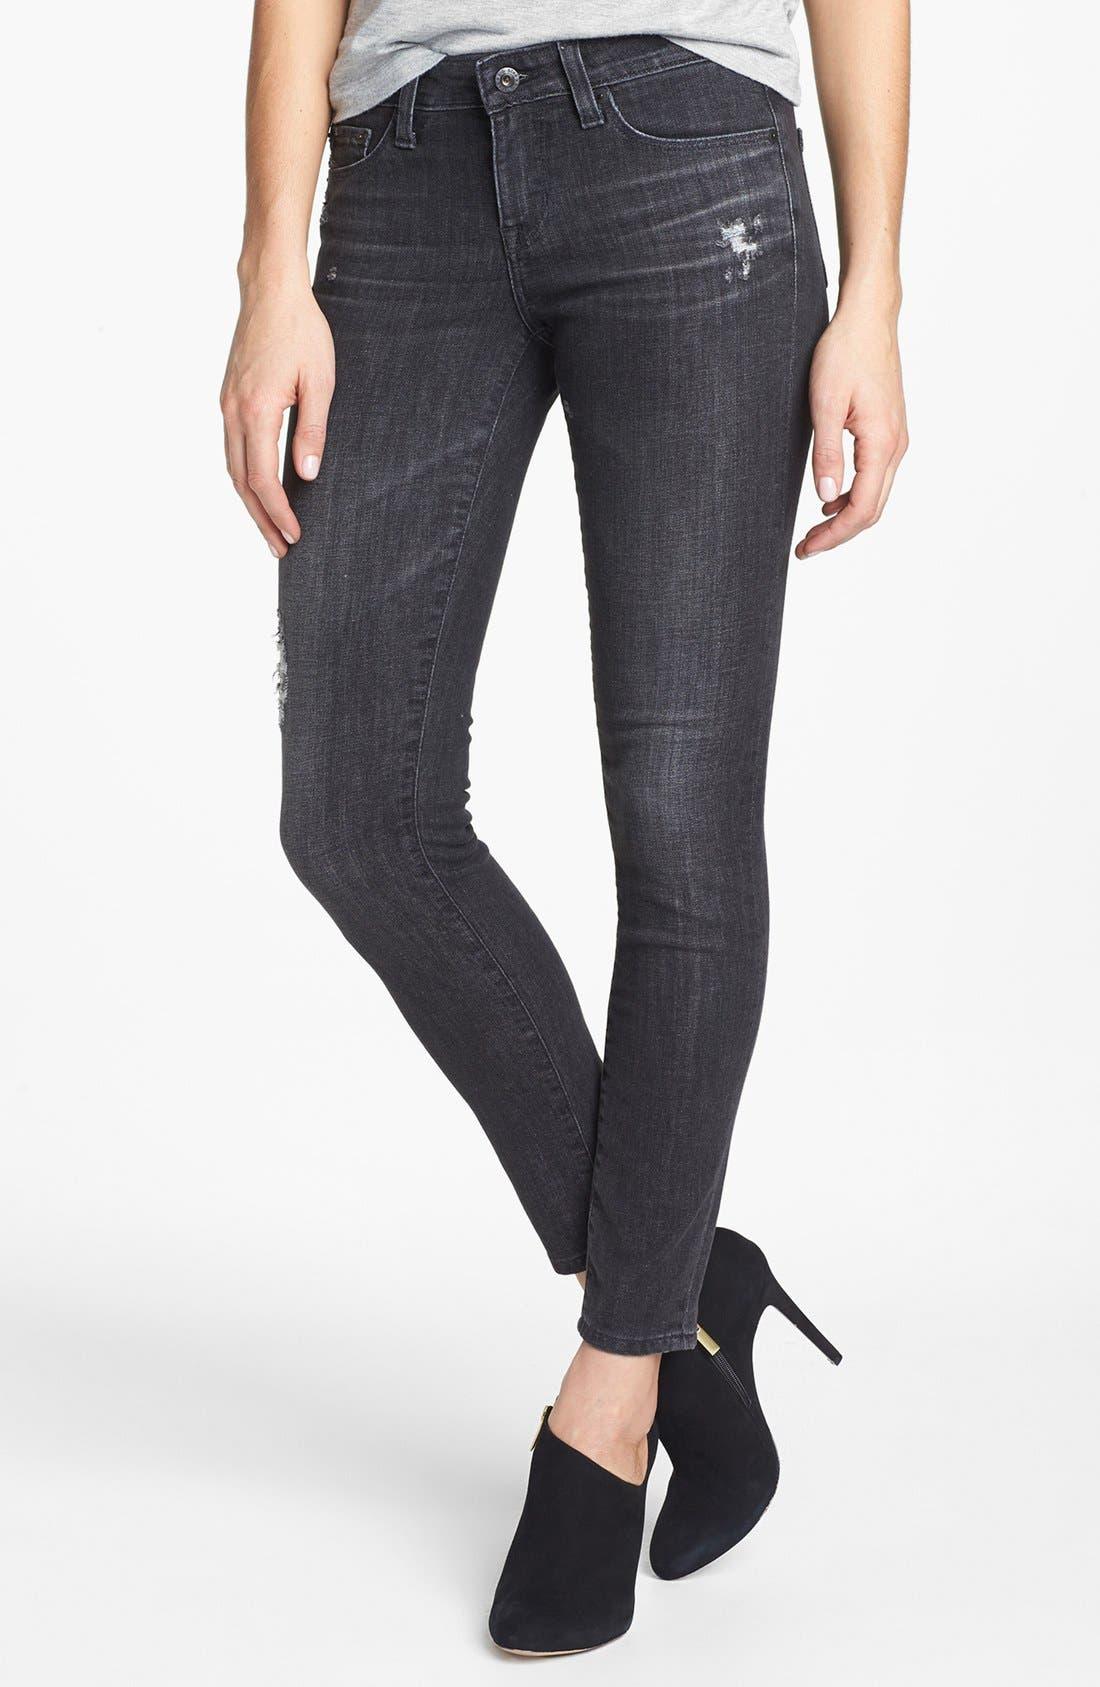 Main Image - Big Star 'Alex' Skinny Jeans (Moscow) (Petite)